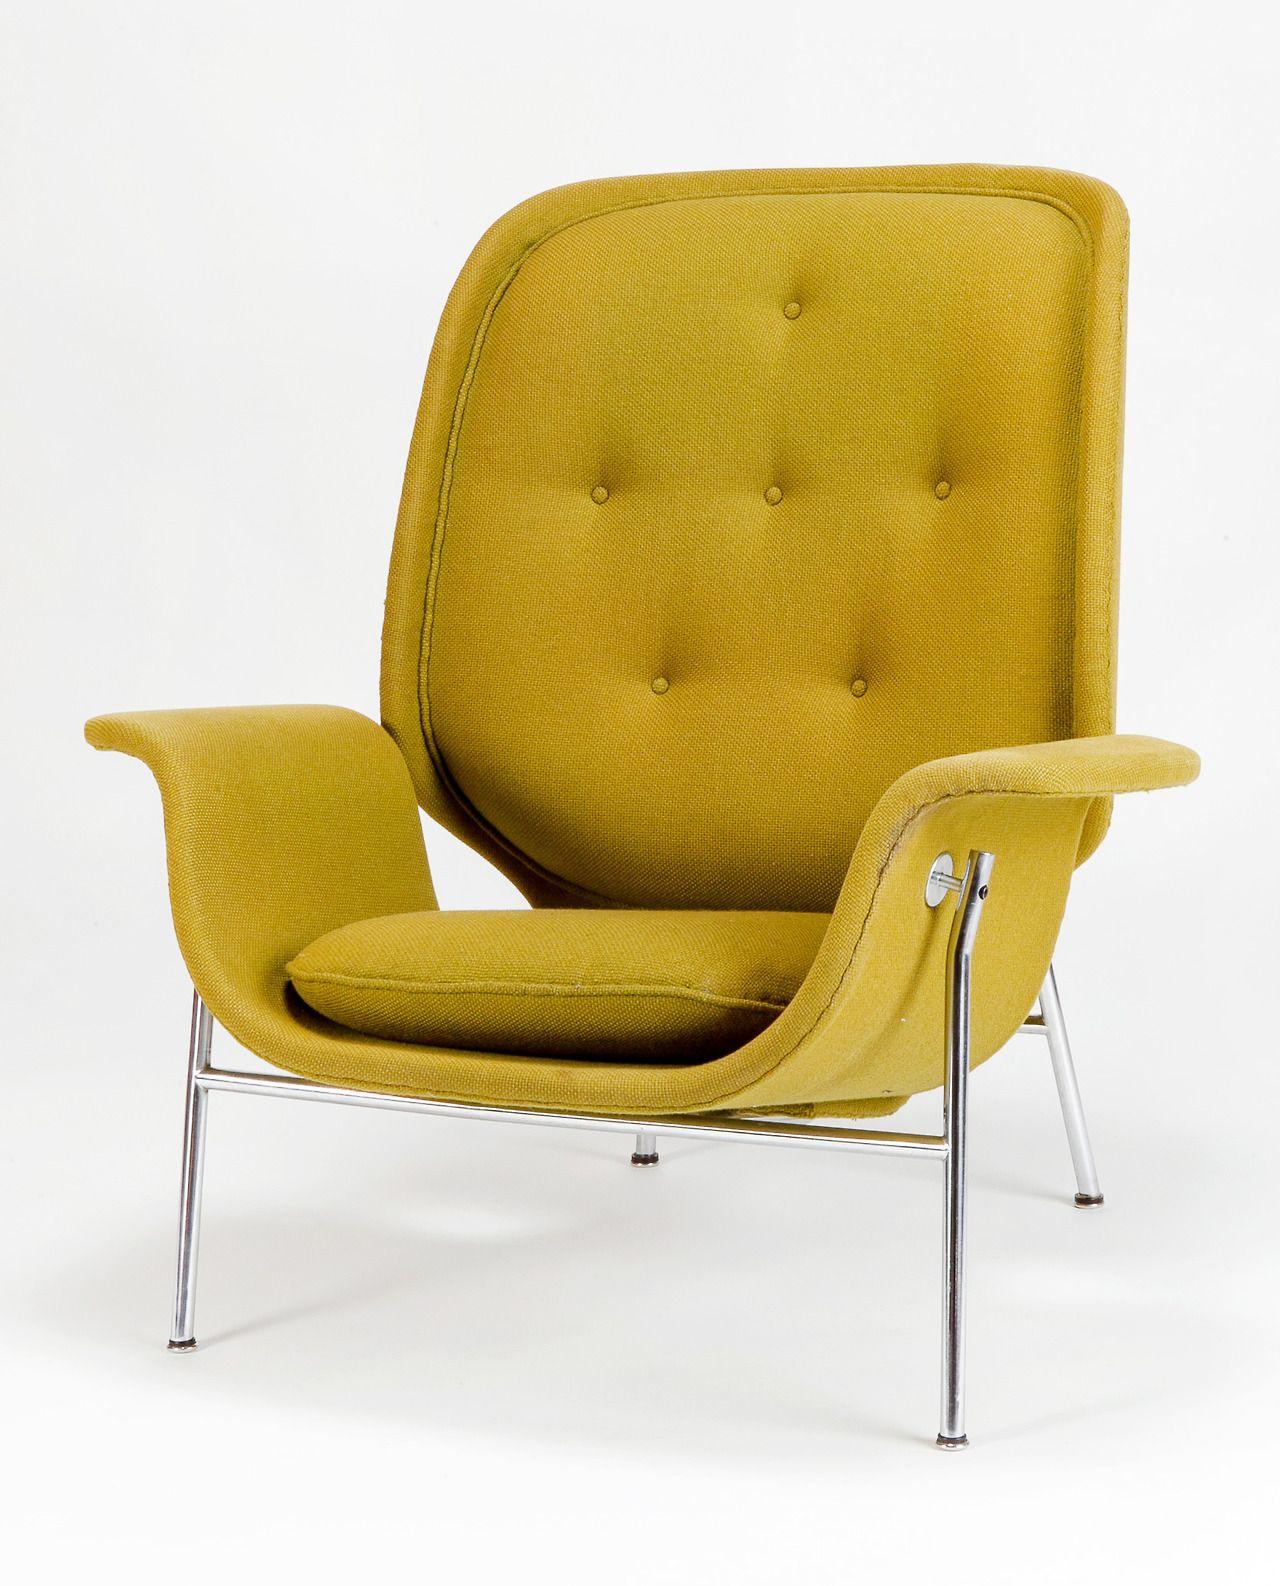 1956 Kangaroo Chair George Nelson For Herman Miller Furniture